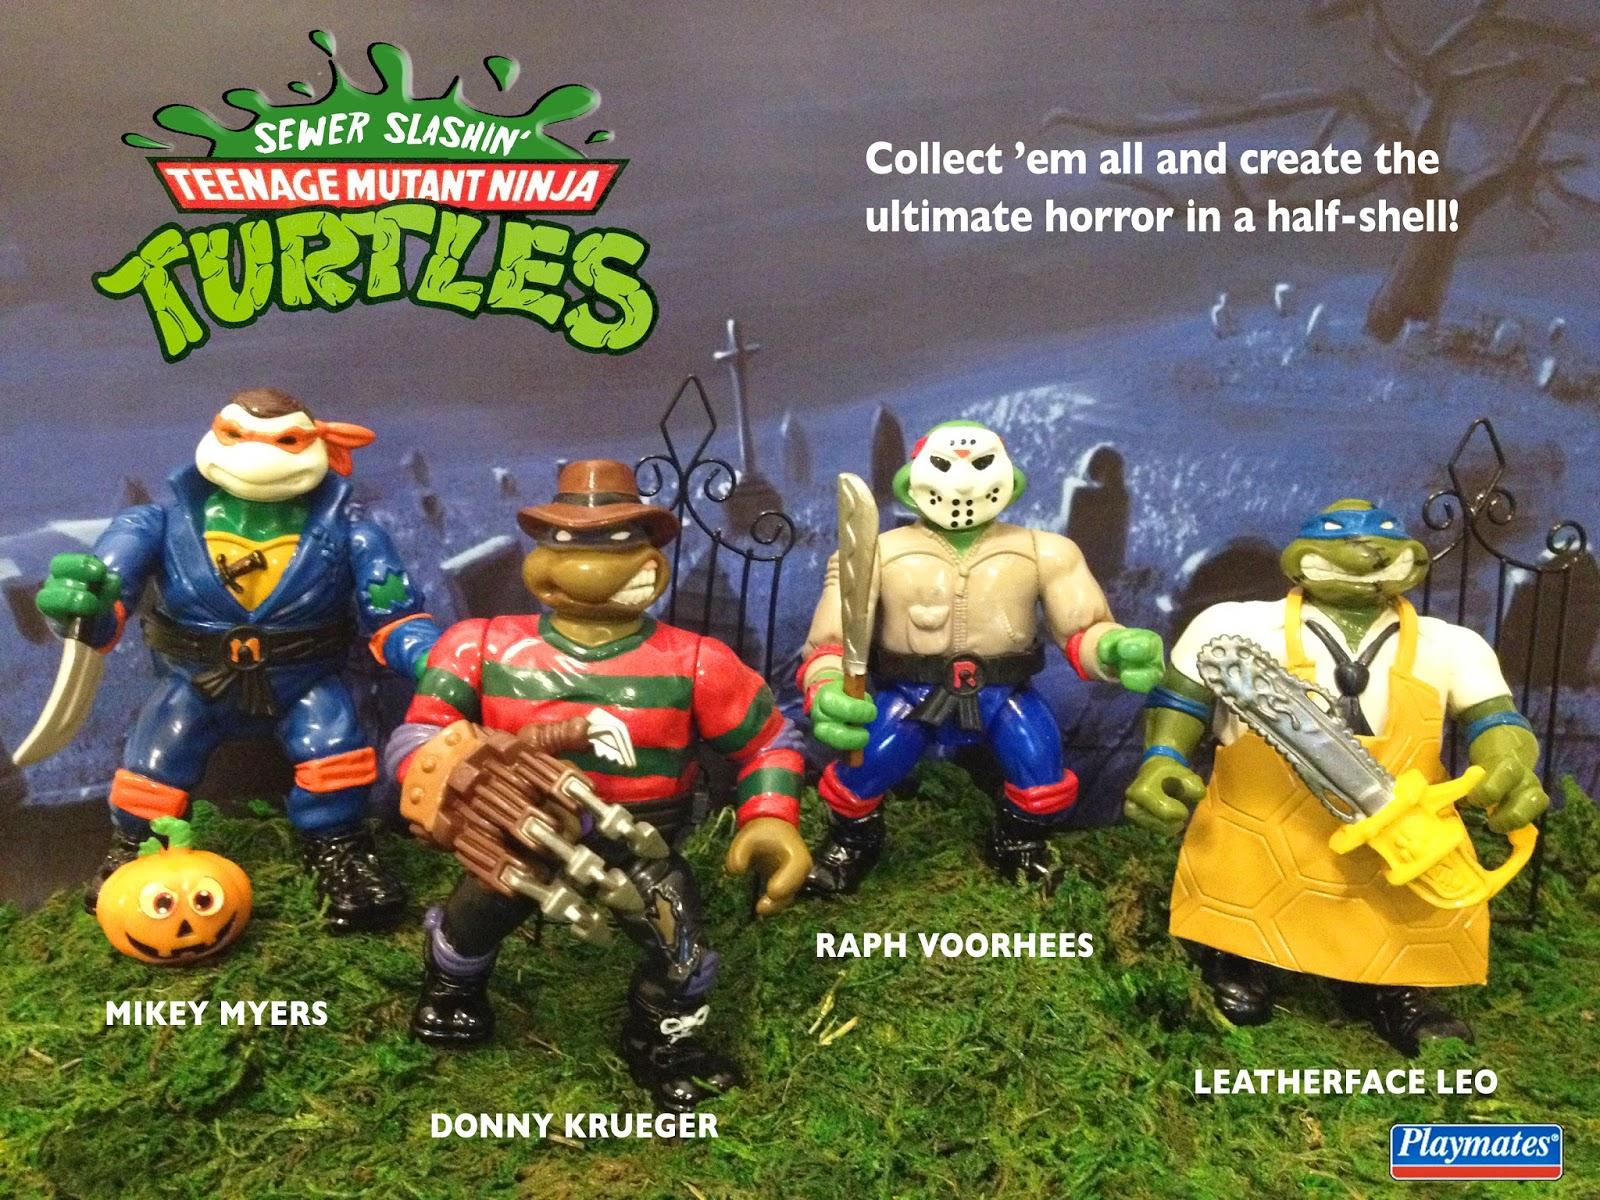 55528157f Death by Toys: New Customs: Ninja Turtles Based on Horror Movies